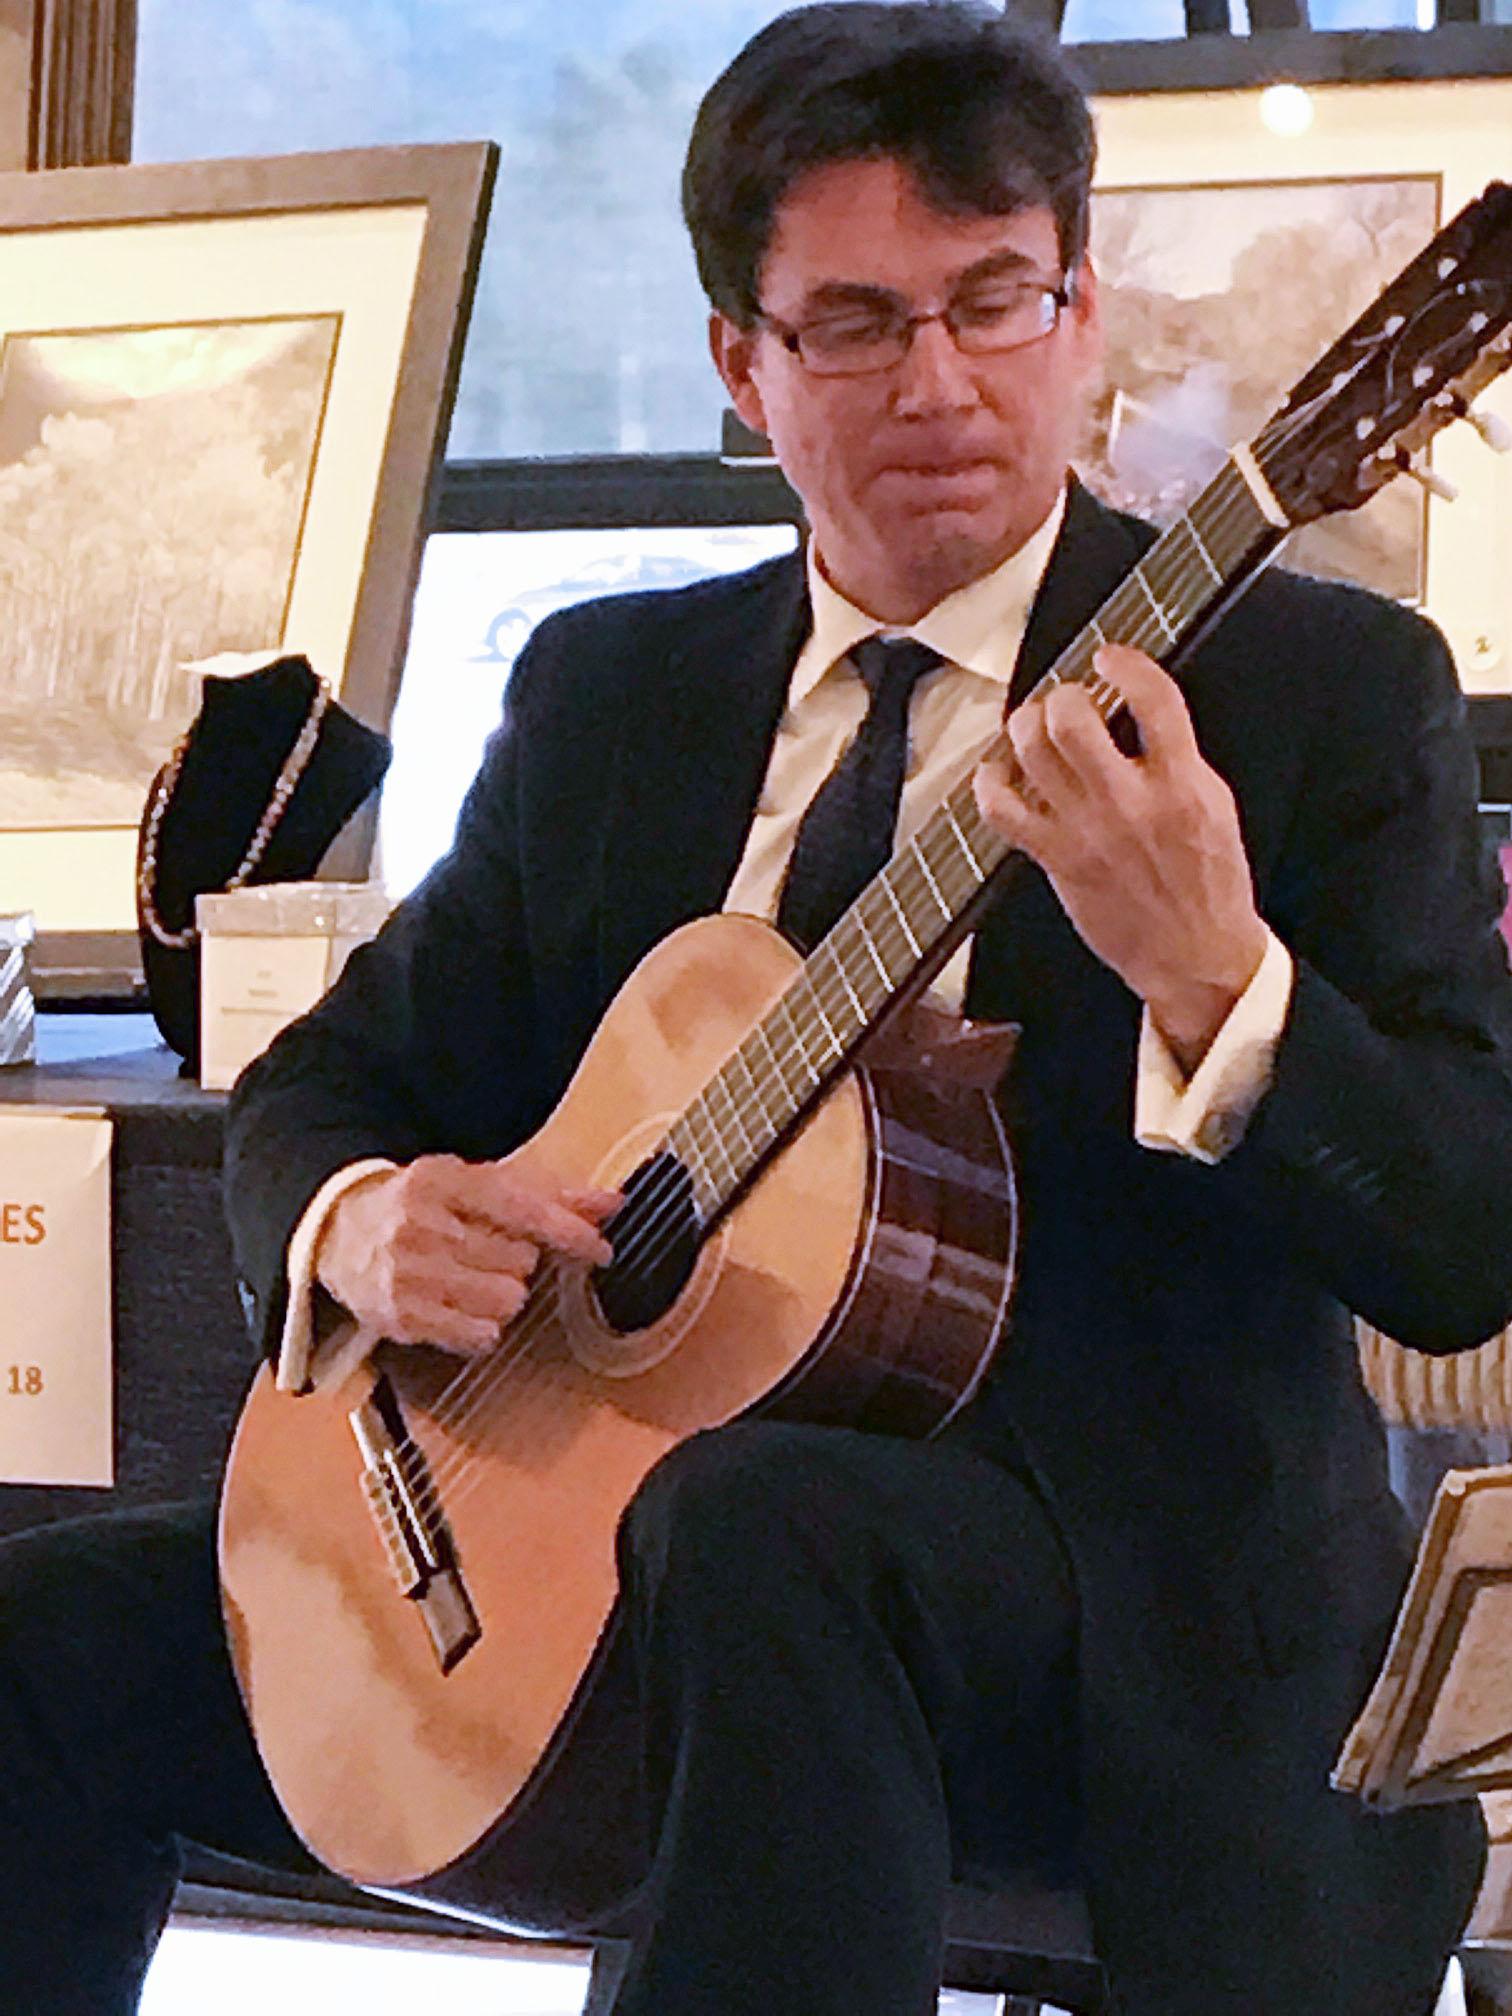 Guitarist Peter Fletcher returns to Mesquite